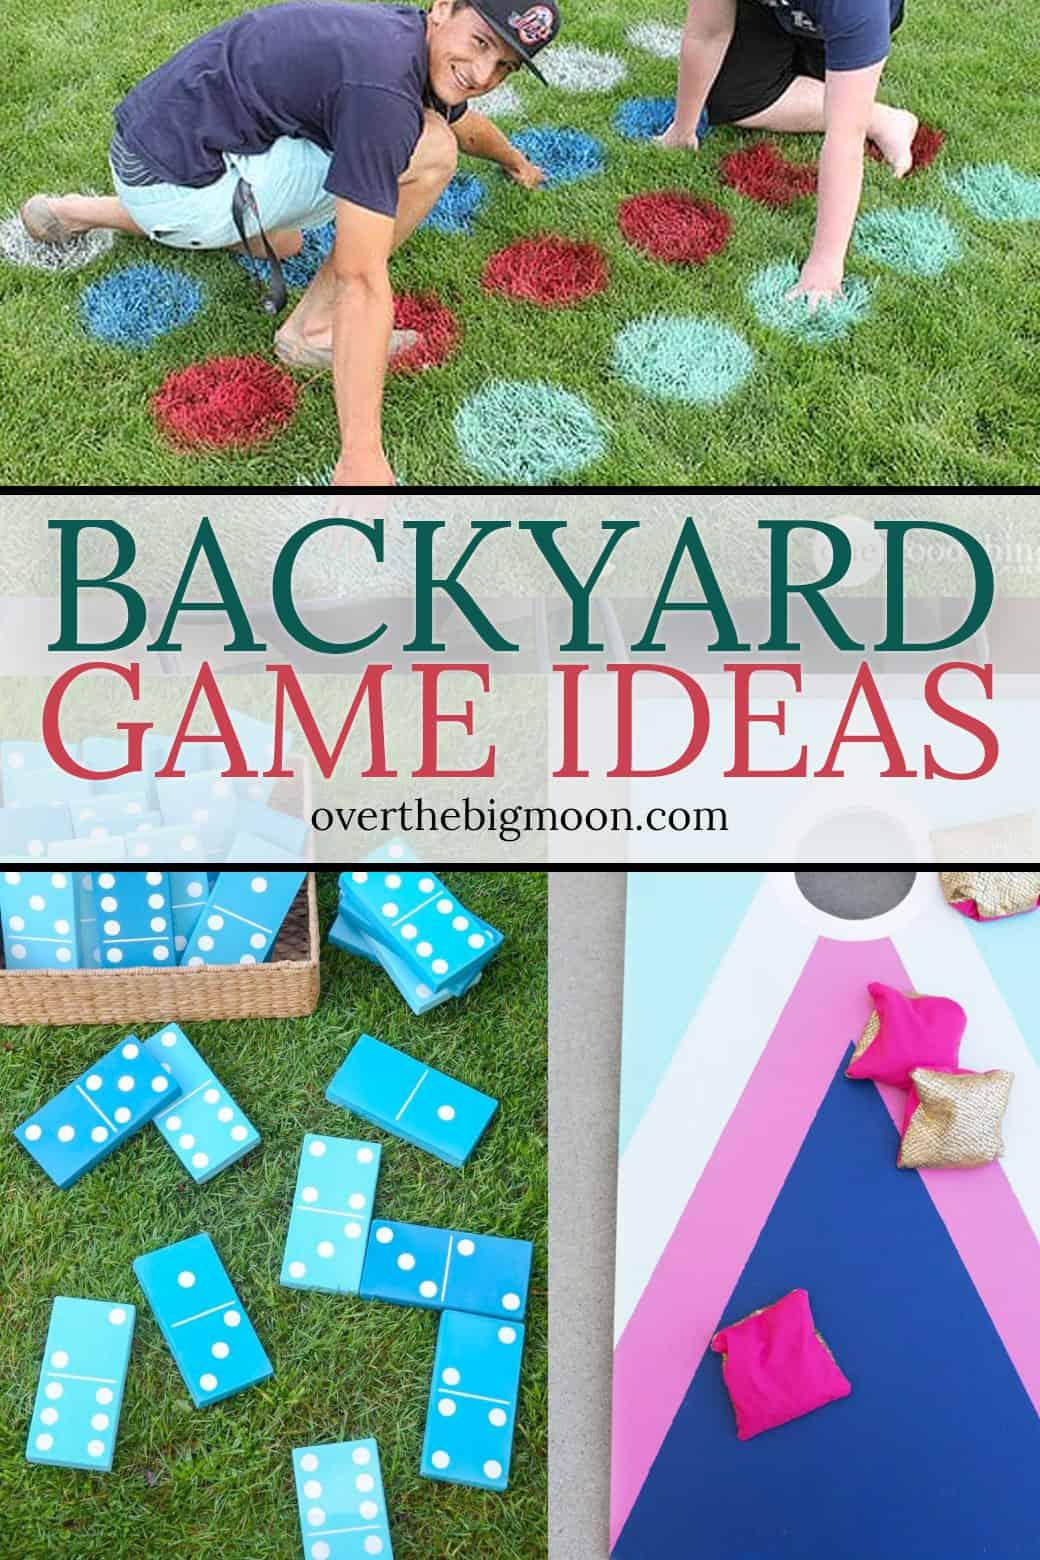 35 Fun Backyard Game Ideas from overthebigmoon.com!